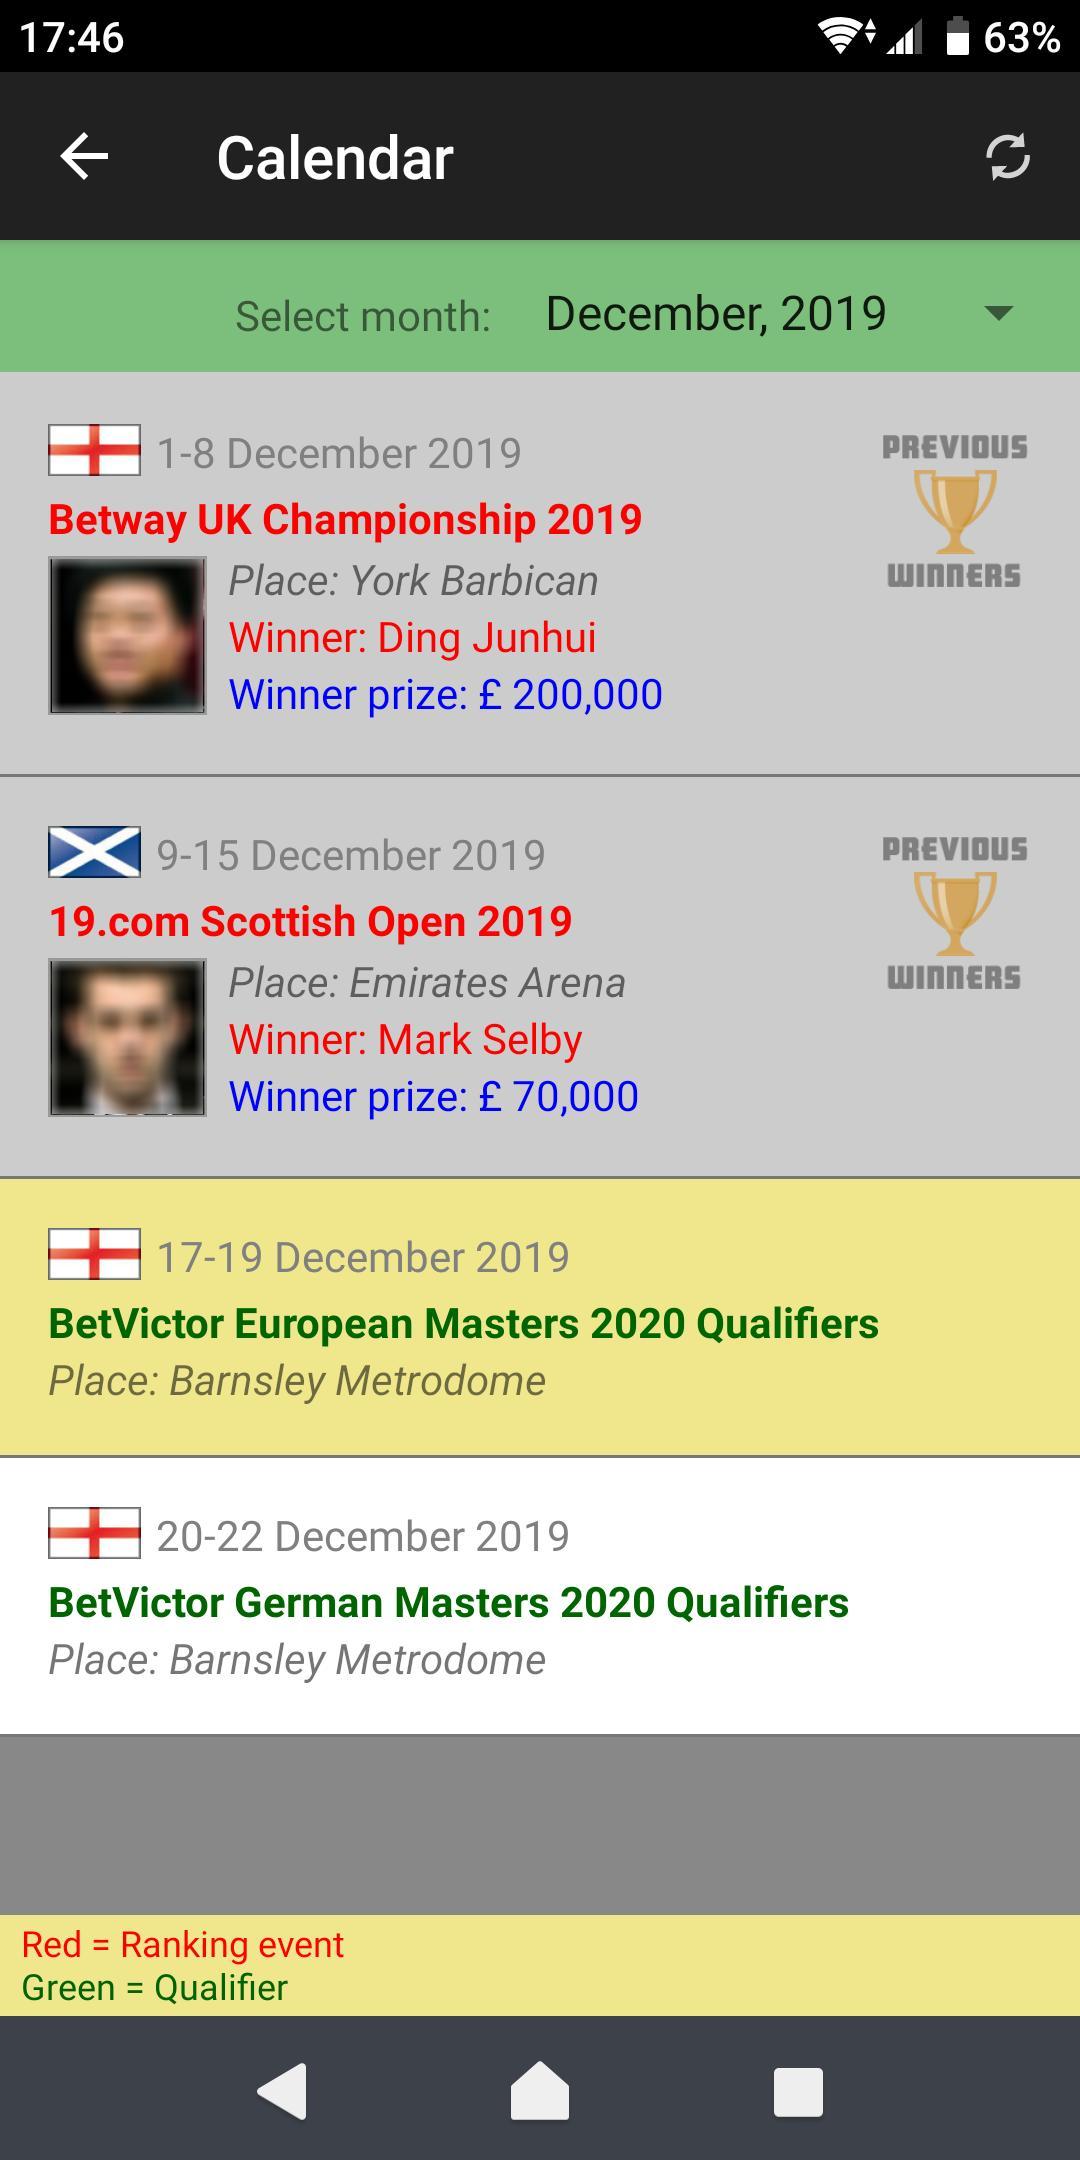 Snooker world ranking points 2019/2020